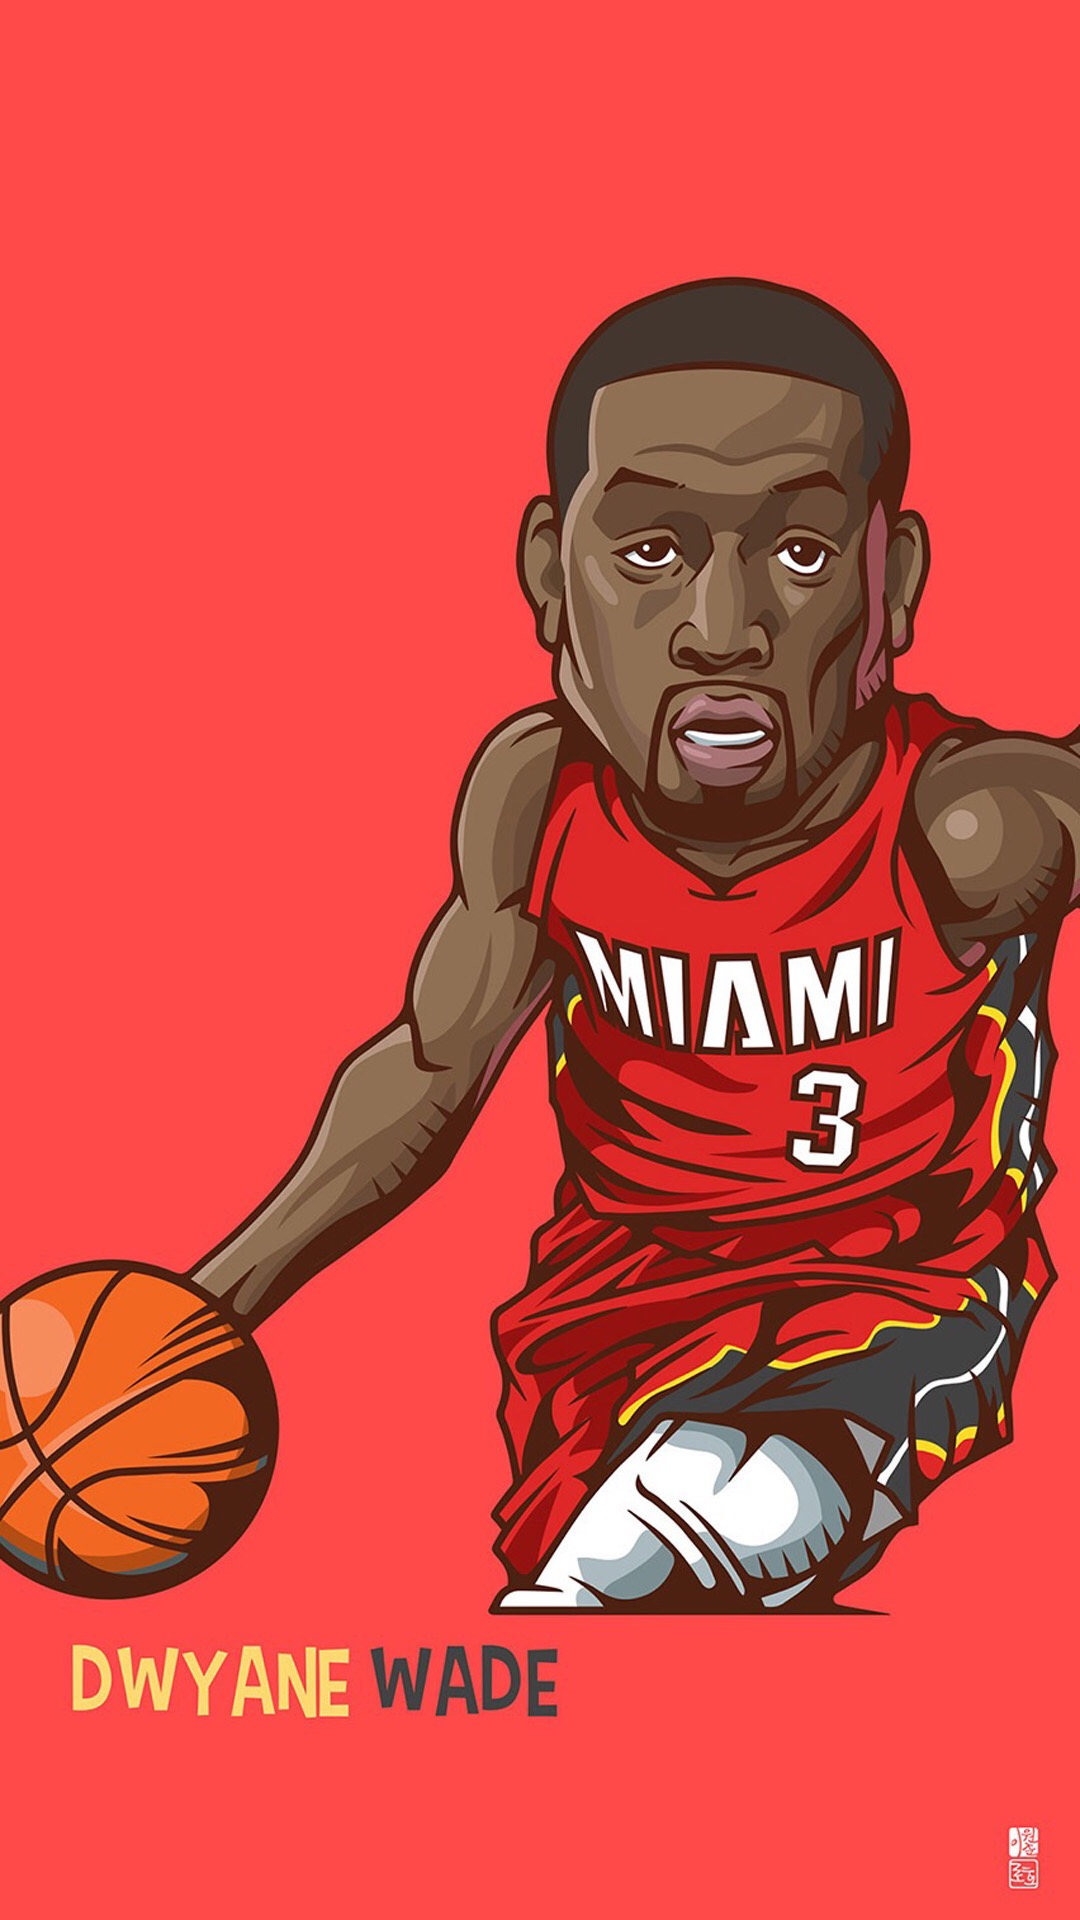 Download-Dwyane-Wade-1080-x-1920-nba-miamiheat-basketball-wade-mobile-wallpaper-wp3605002